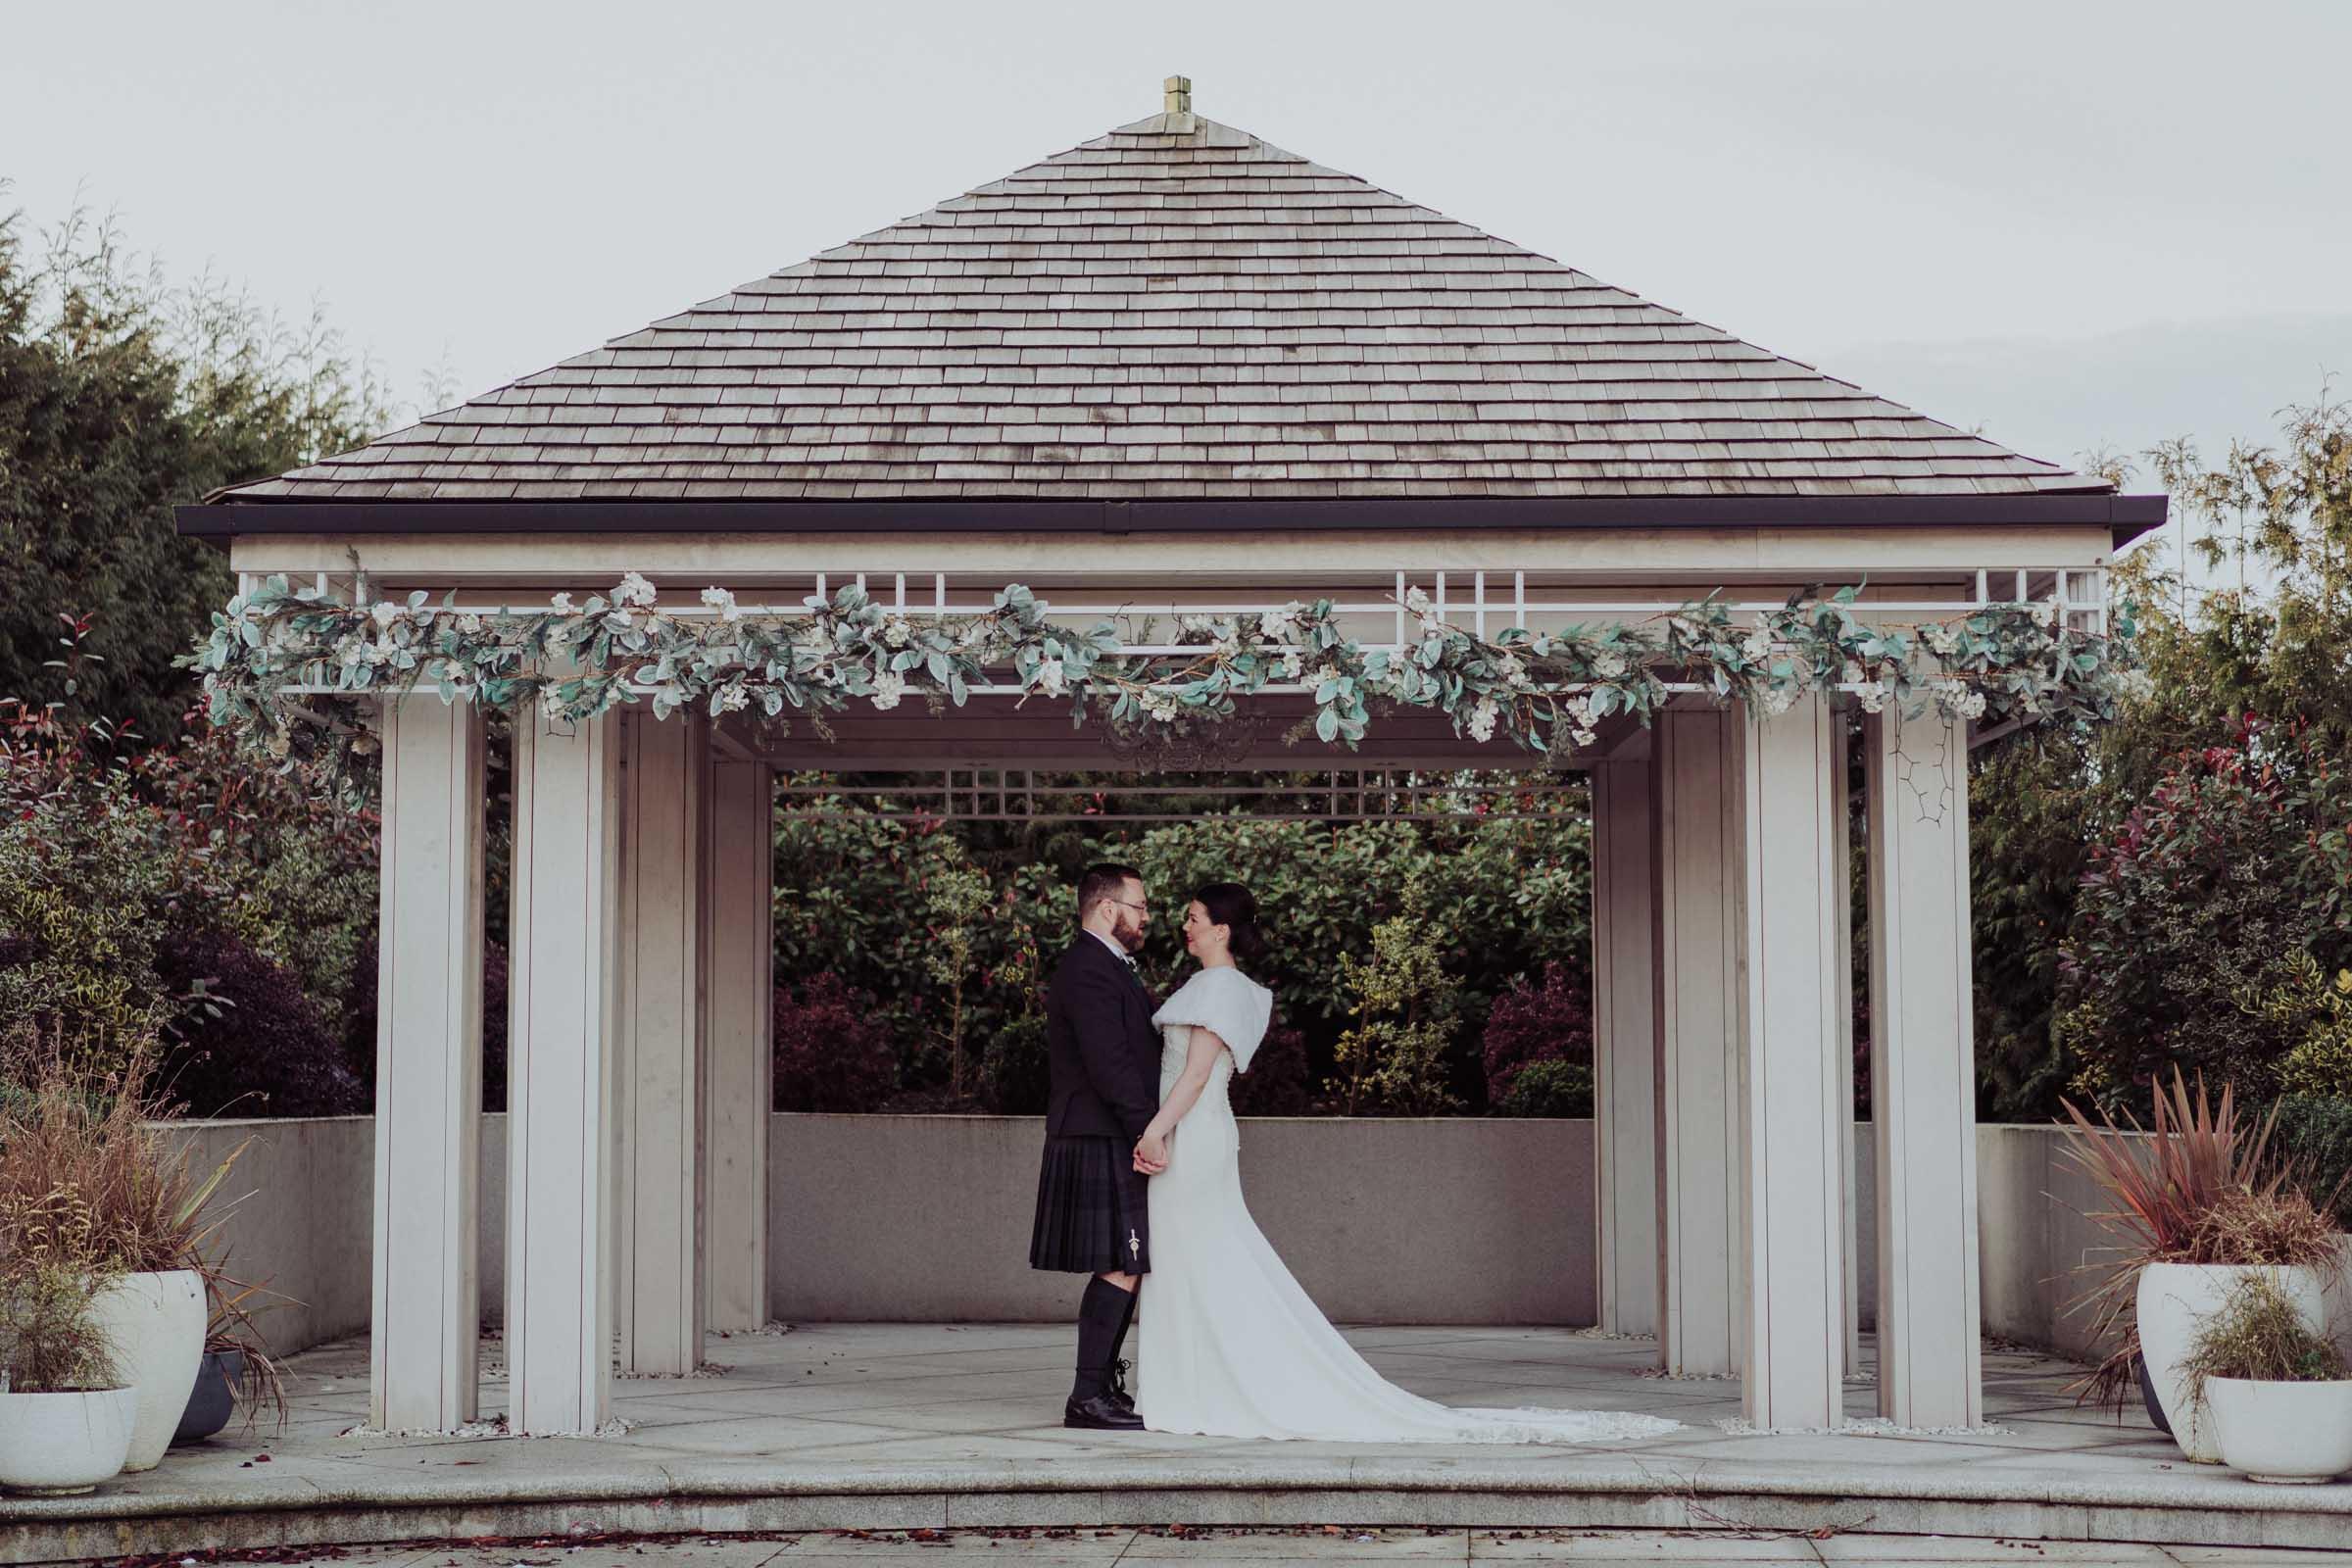 Radstone-Wedding-Dearly-Photography-Scotland (34 of 50).jpg